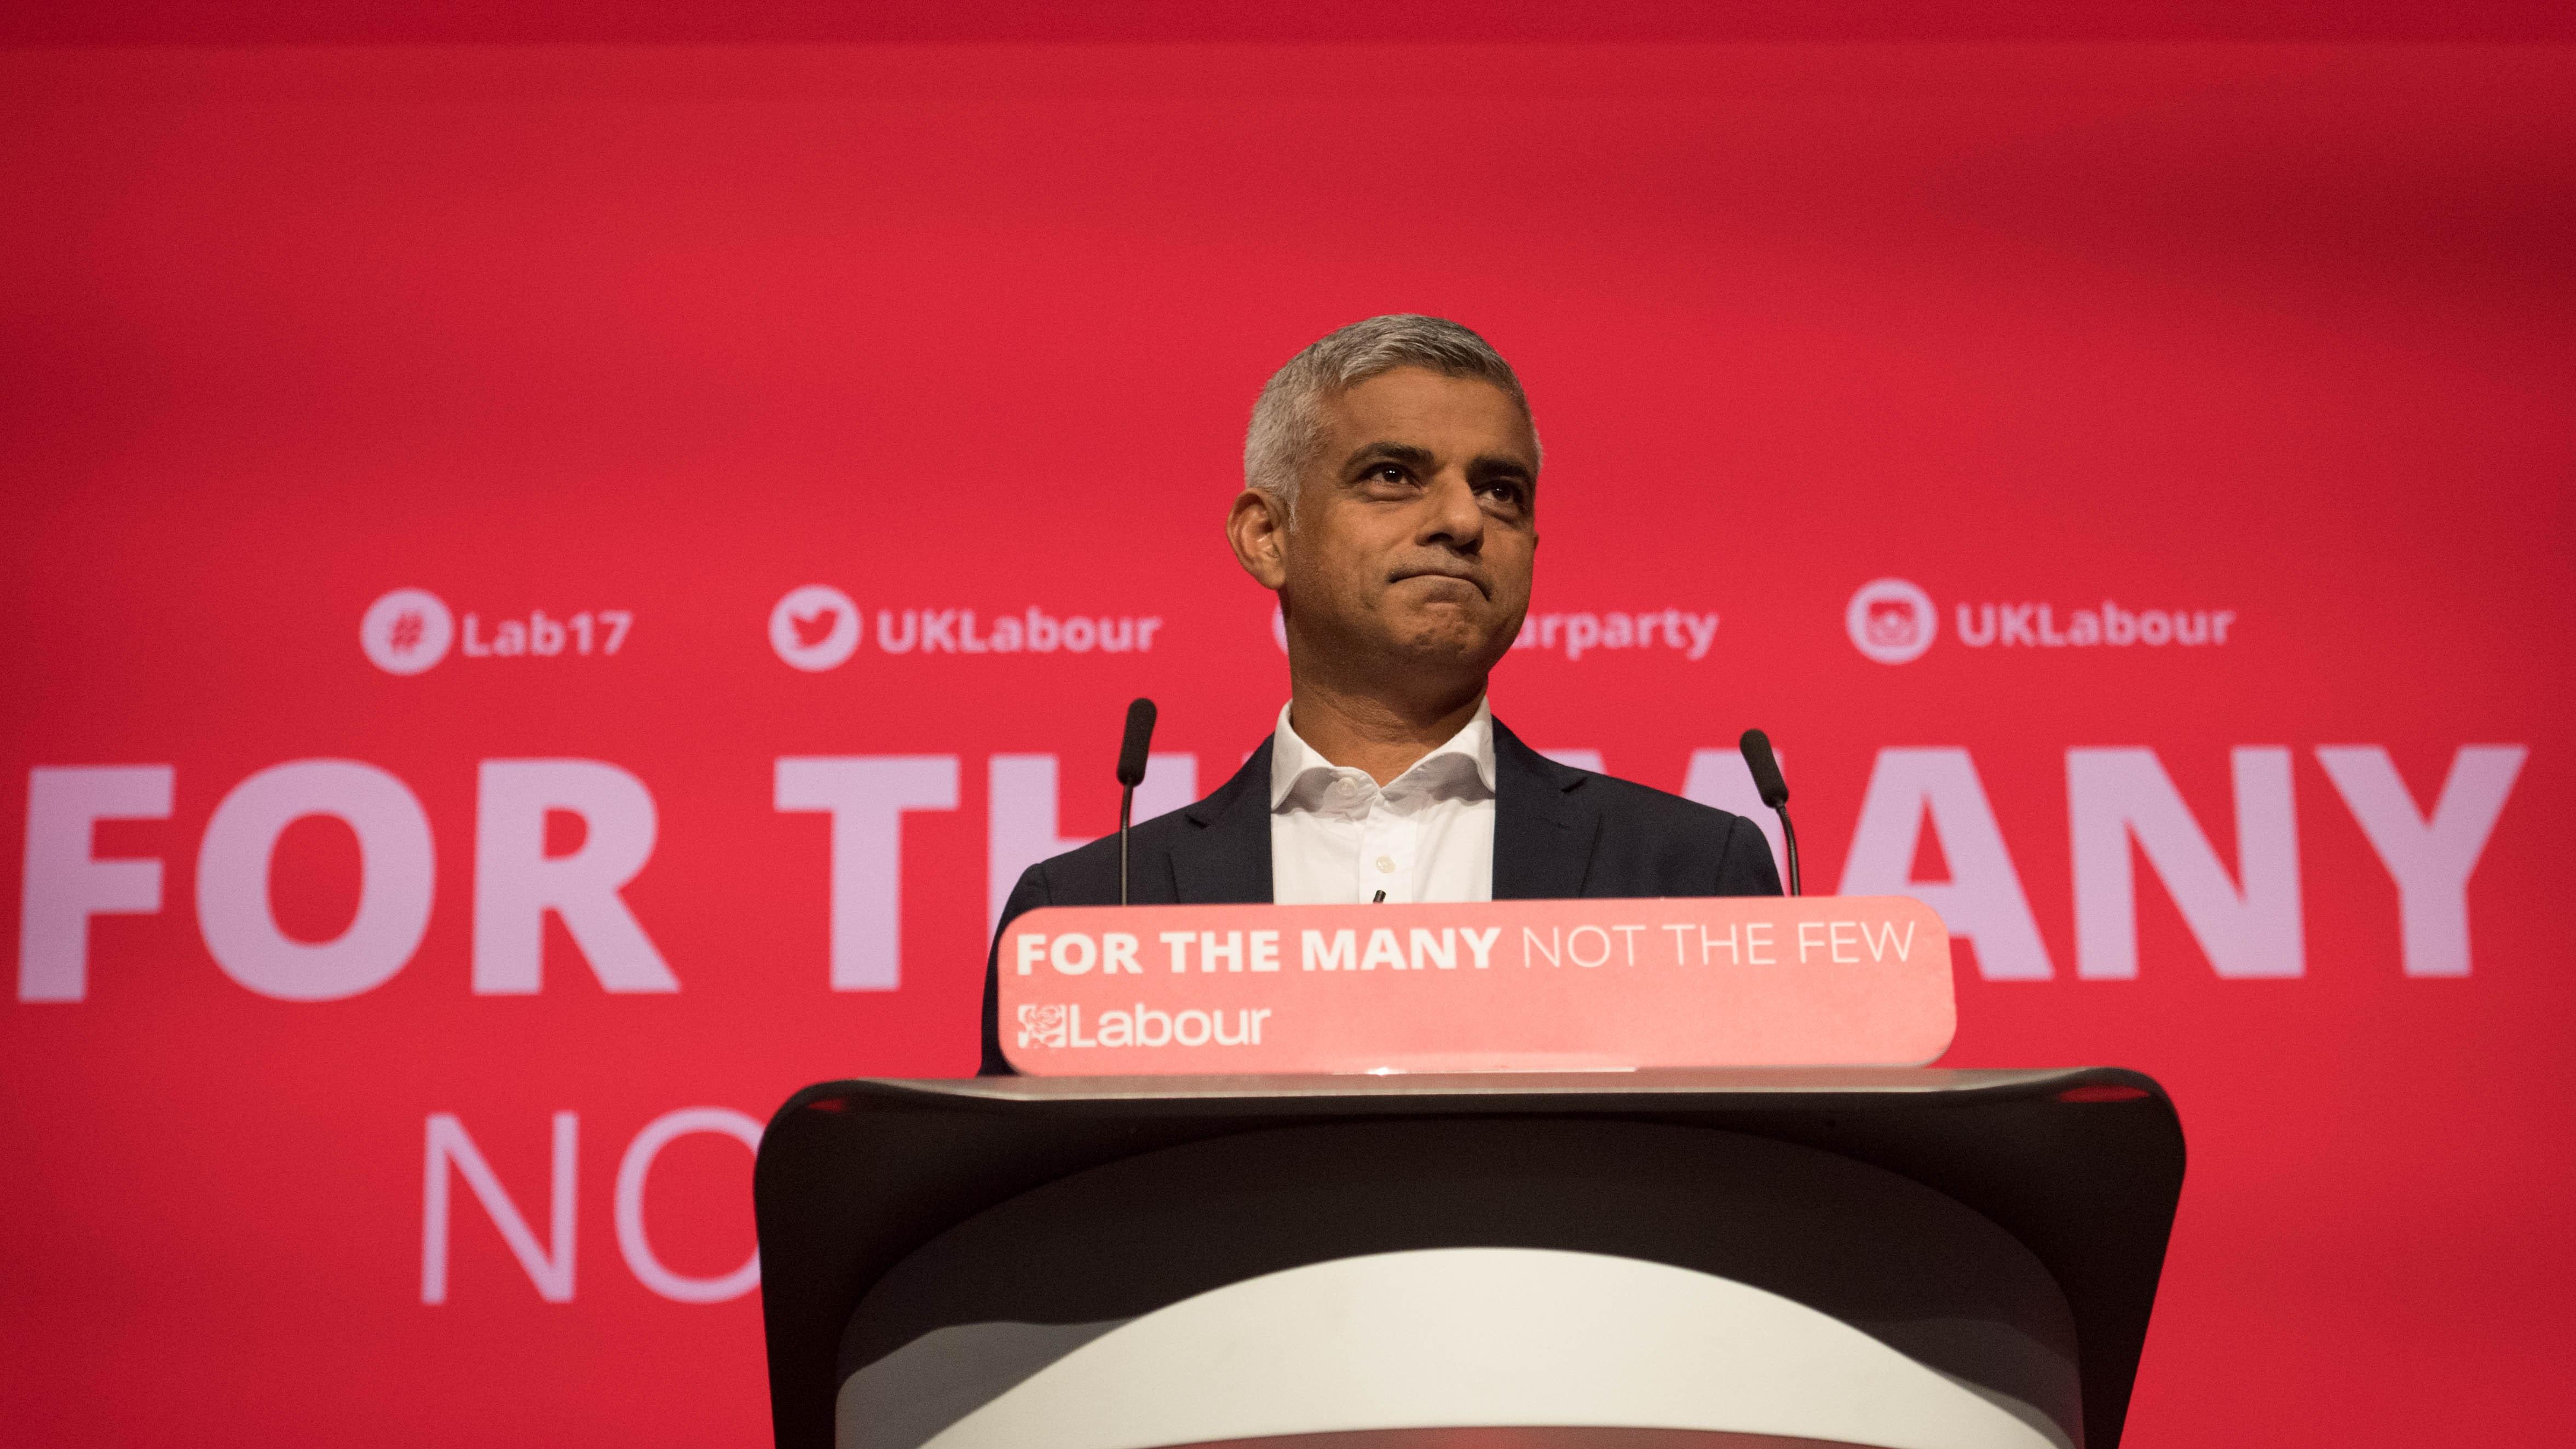 UK Jewish groups accuse Labour of tolerating anti-Semitism